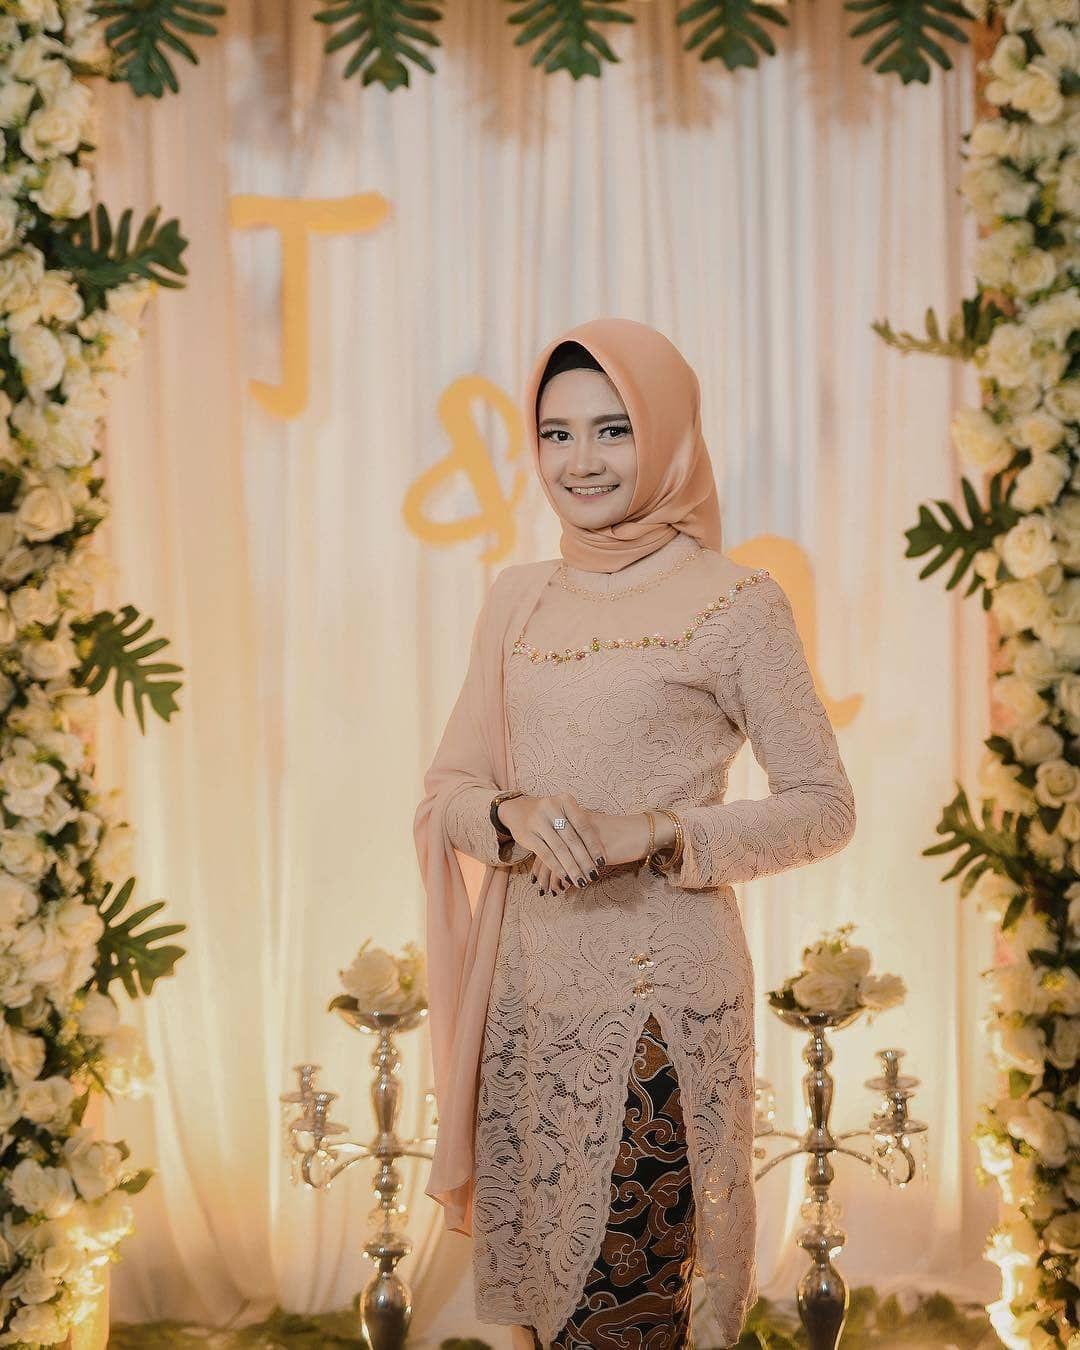 BridesmaidKebayaWisuda di Instagram Stunning Engagement Kebaya